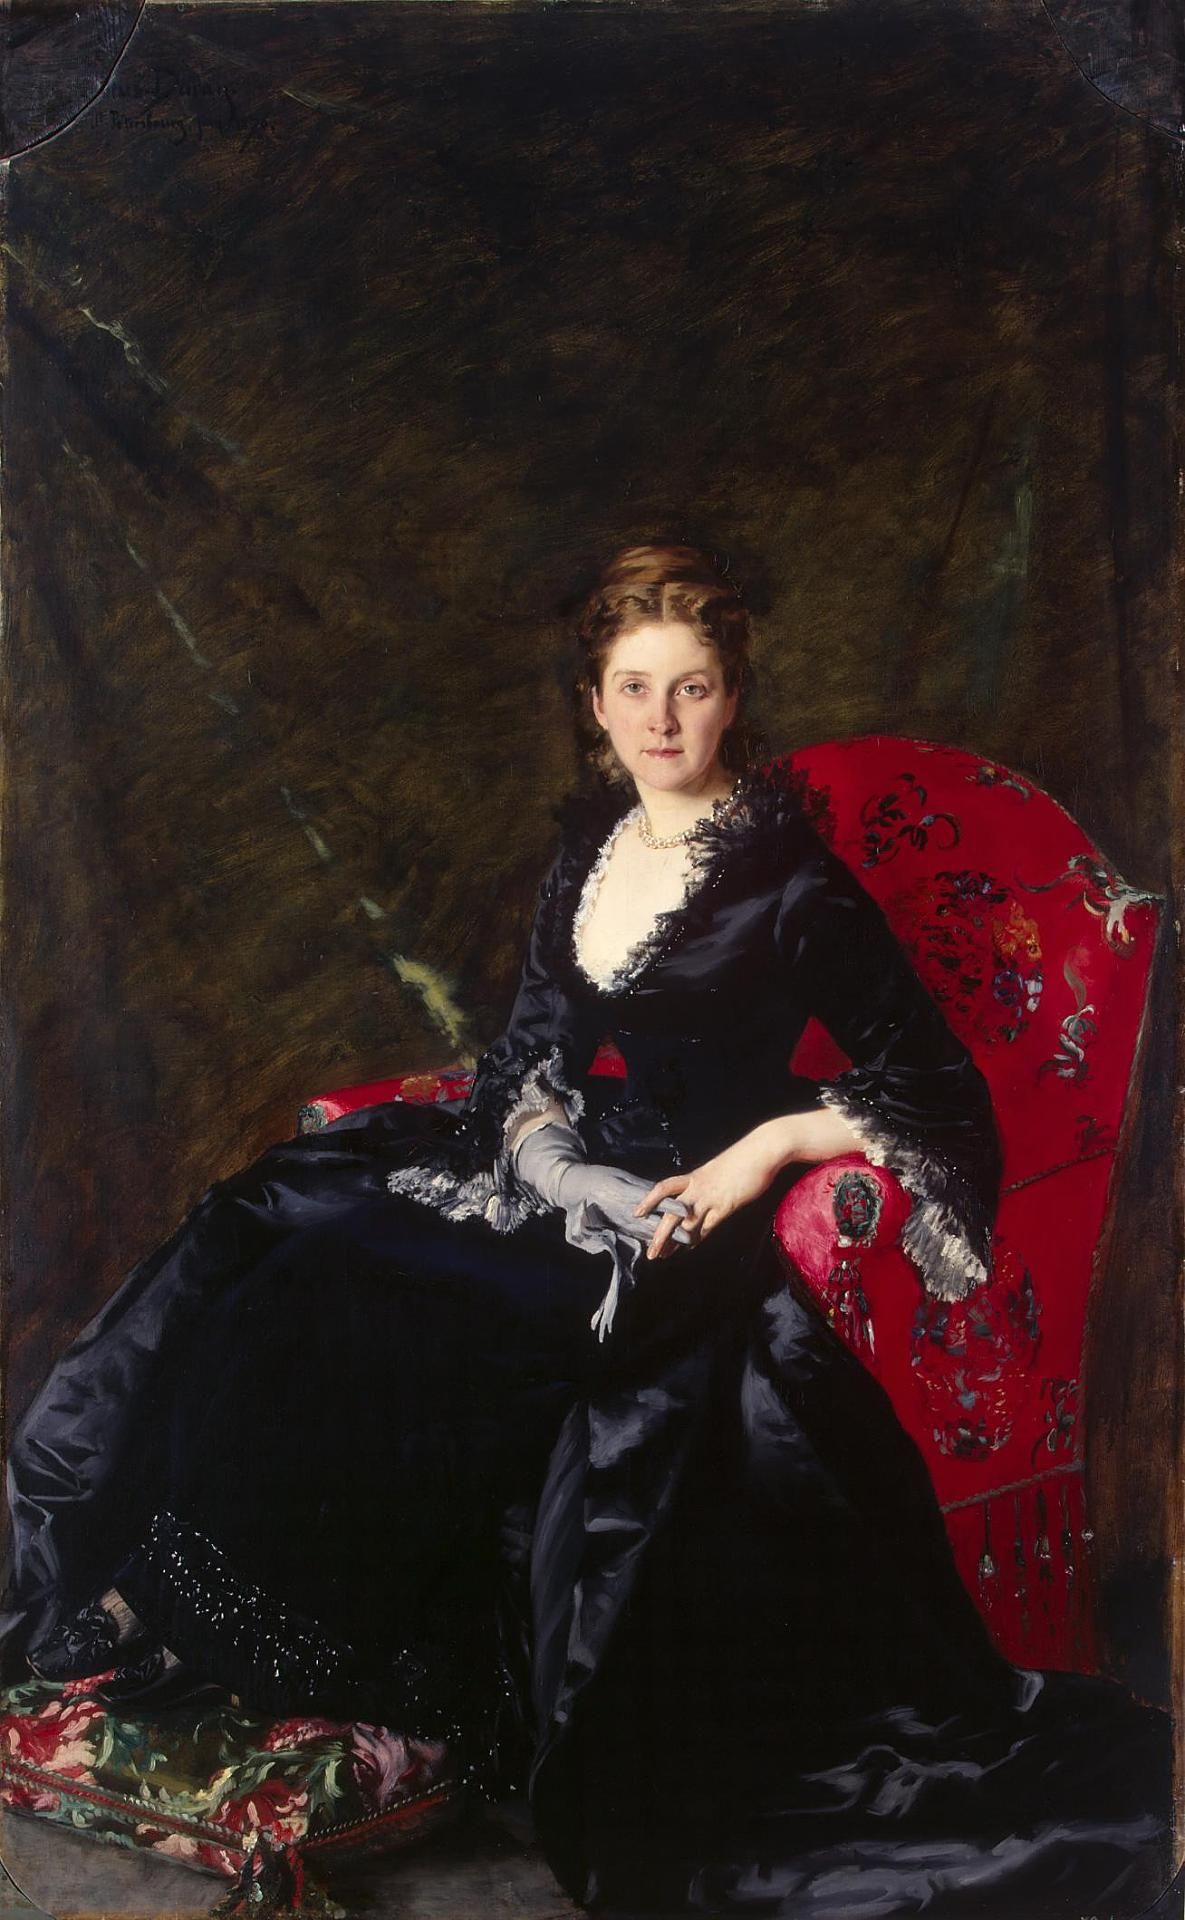 File:Nadezhda Polovtseva by Carolus-Duran.jpg